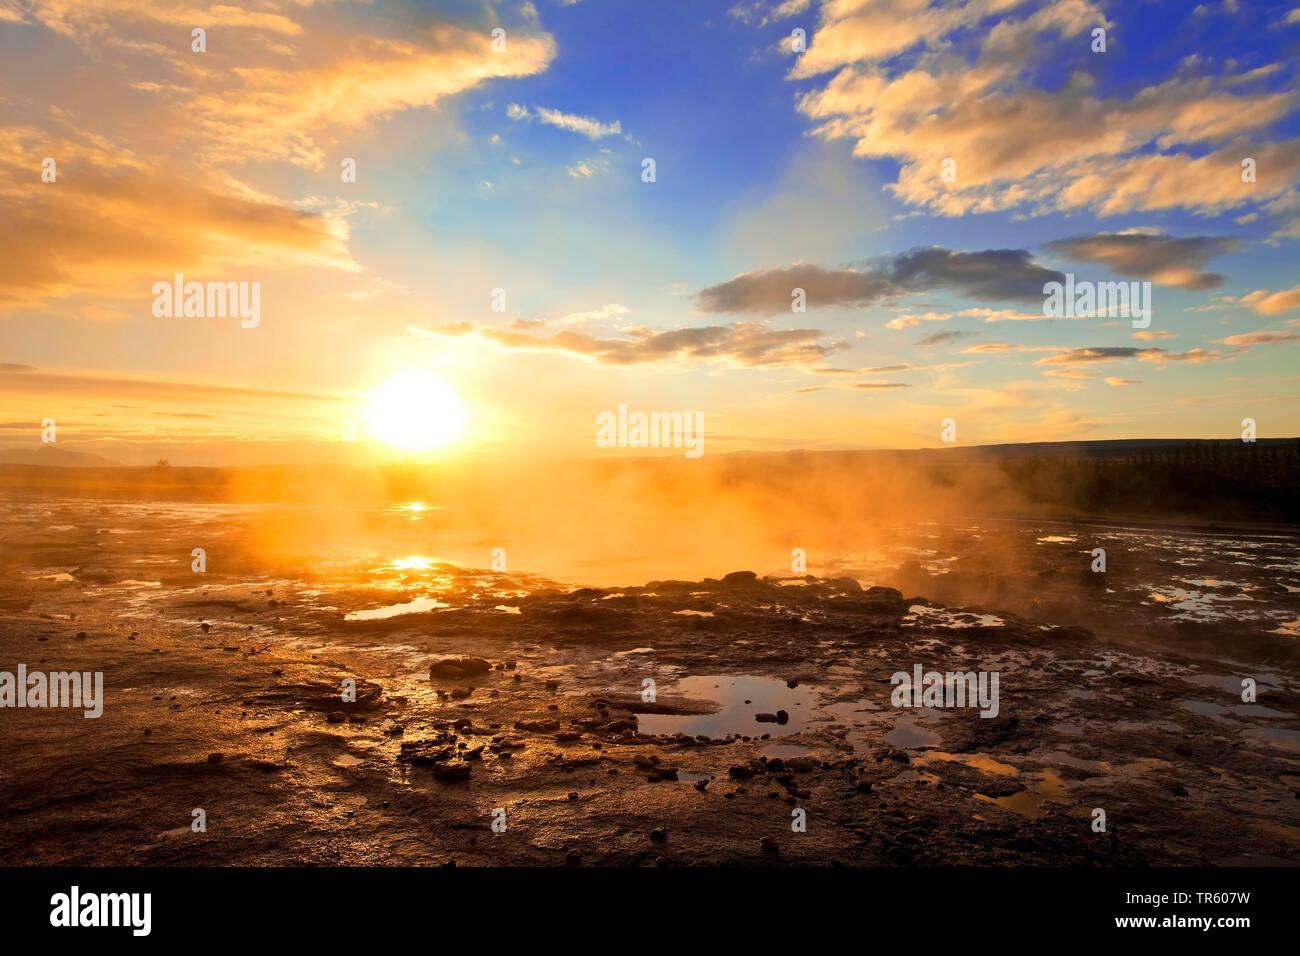 Wasserdampf am Strokkur bei Sonnenaufgang im Hochtemperaturgebiet Haukadalur, Island, Suedisland, Haukadalur, Stokkur   vapor cloud at Strokkur at sun - Stock Image